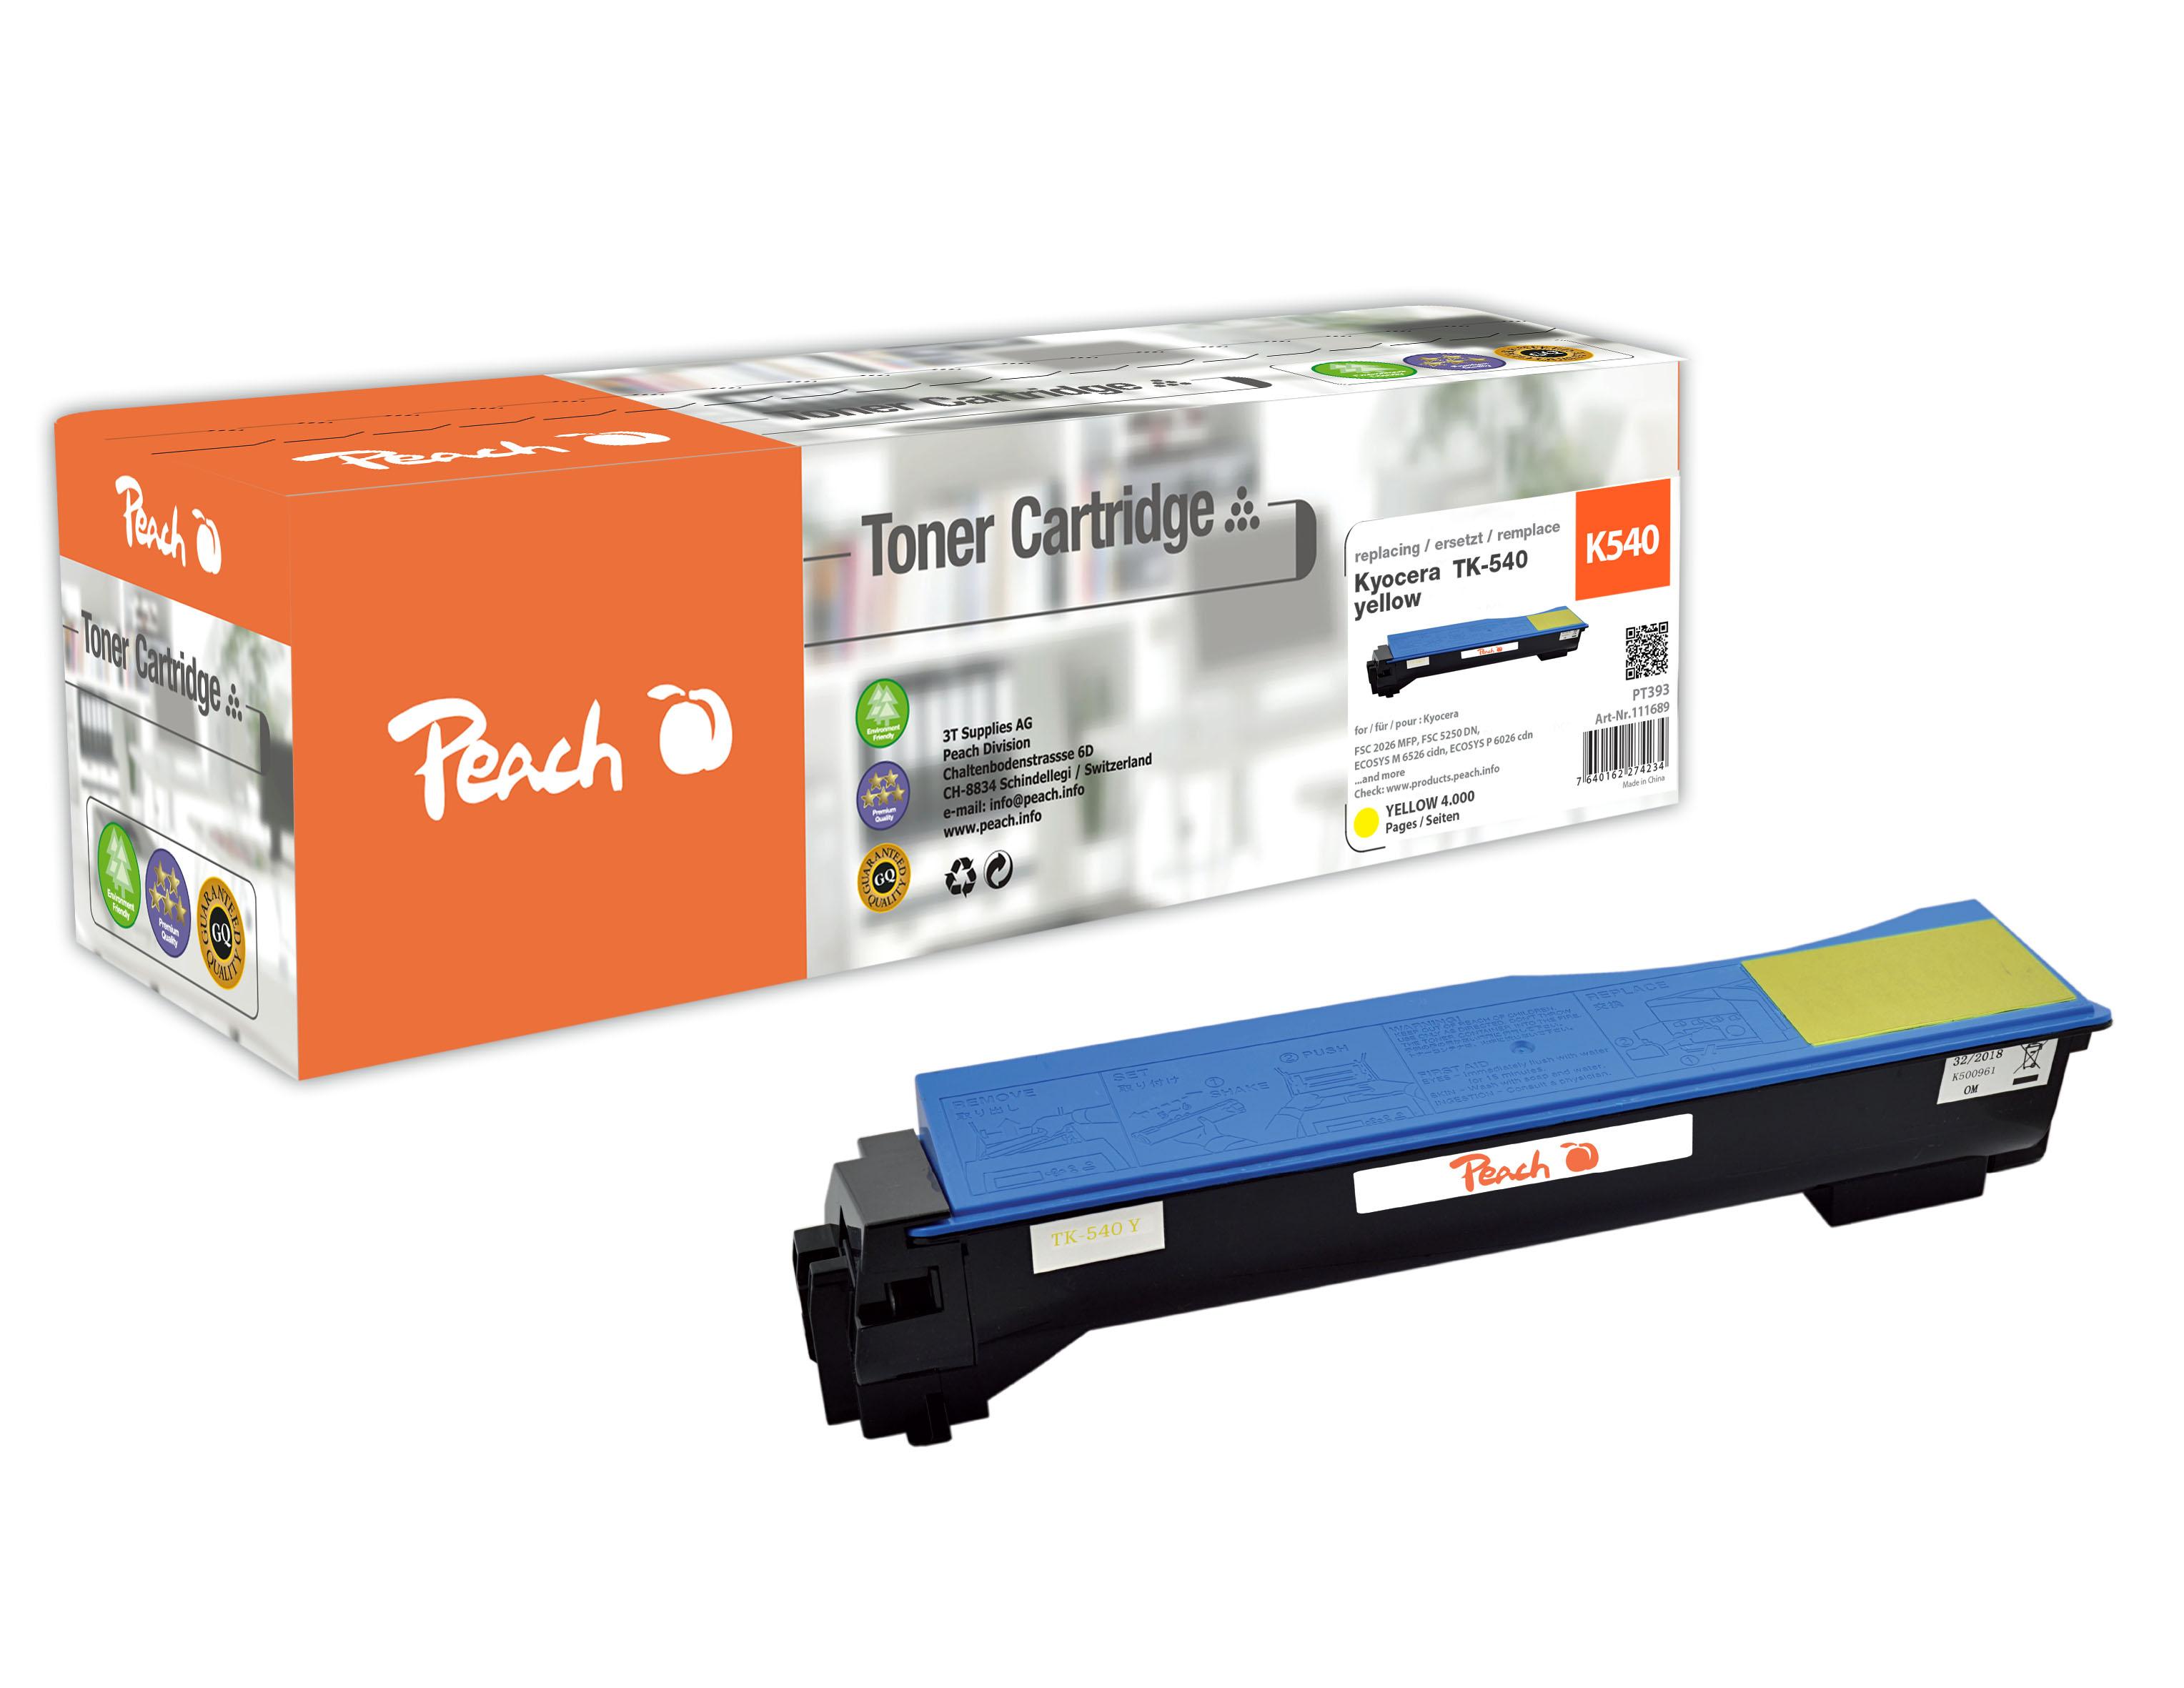 Peach  Tonermodul gelb kompatibel zu Kyocera FSC 5100 DN